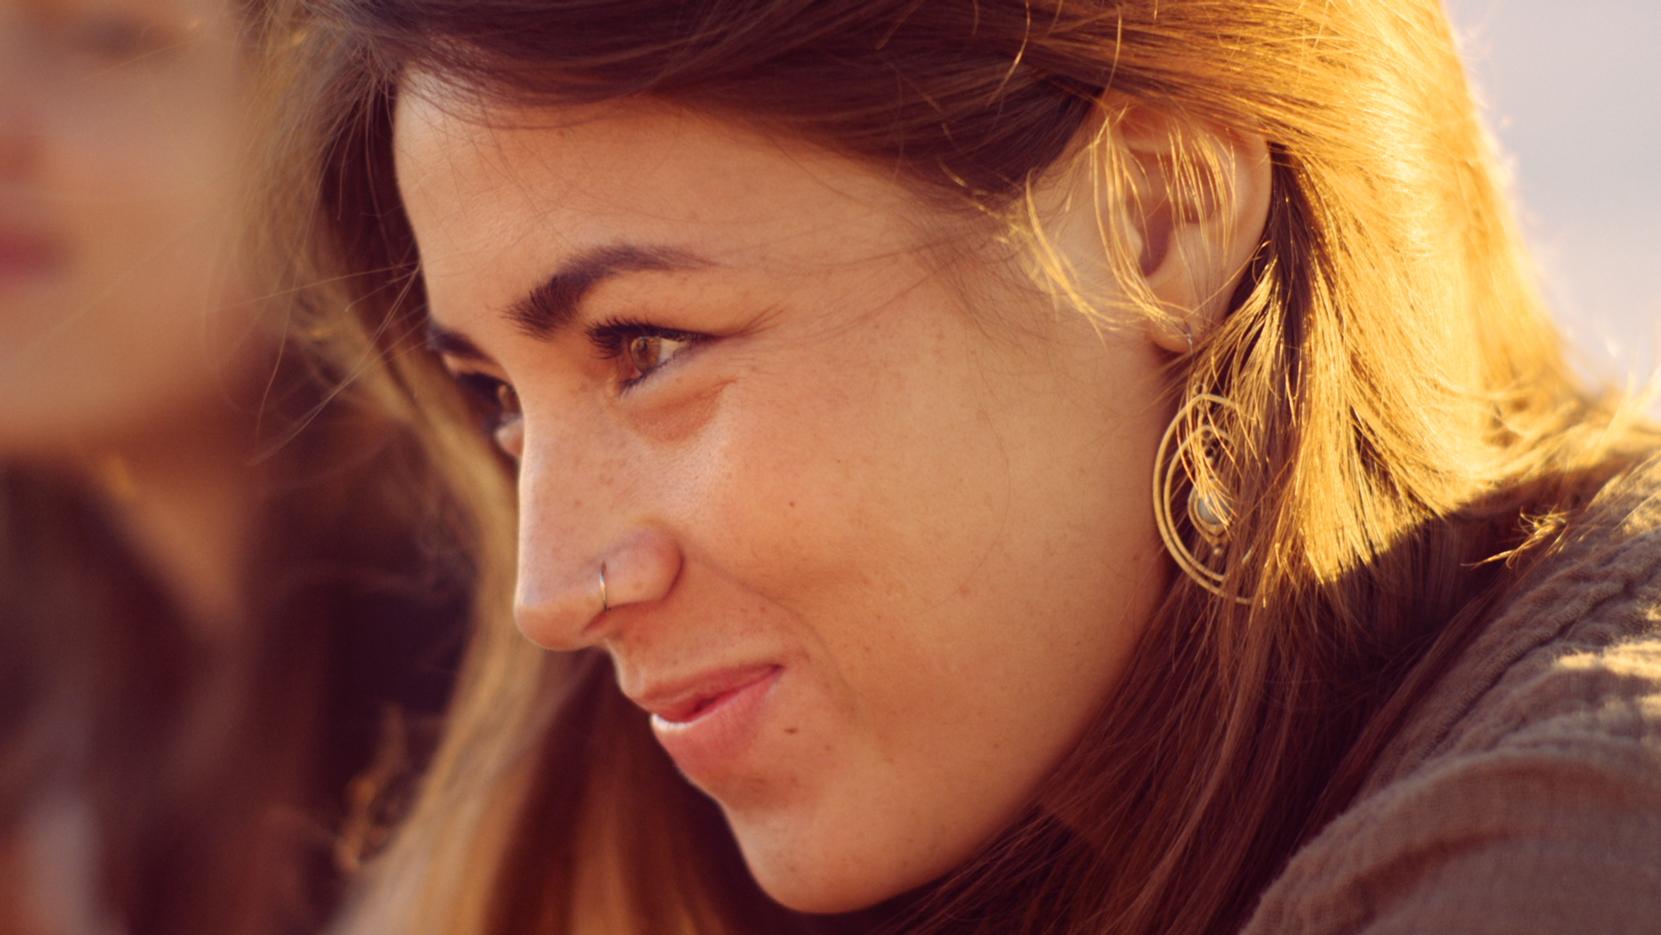 Sun Life Organics | Love Heal Inspire